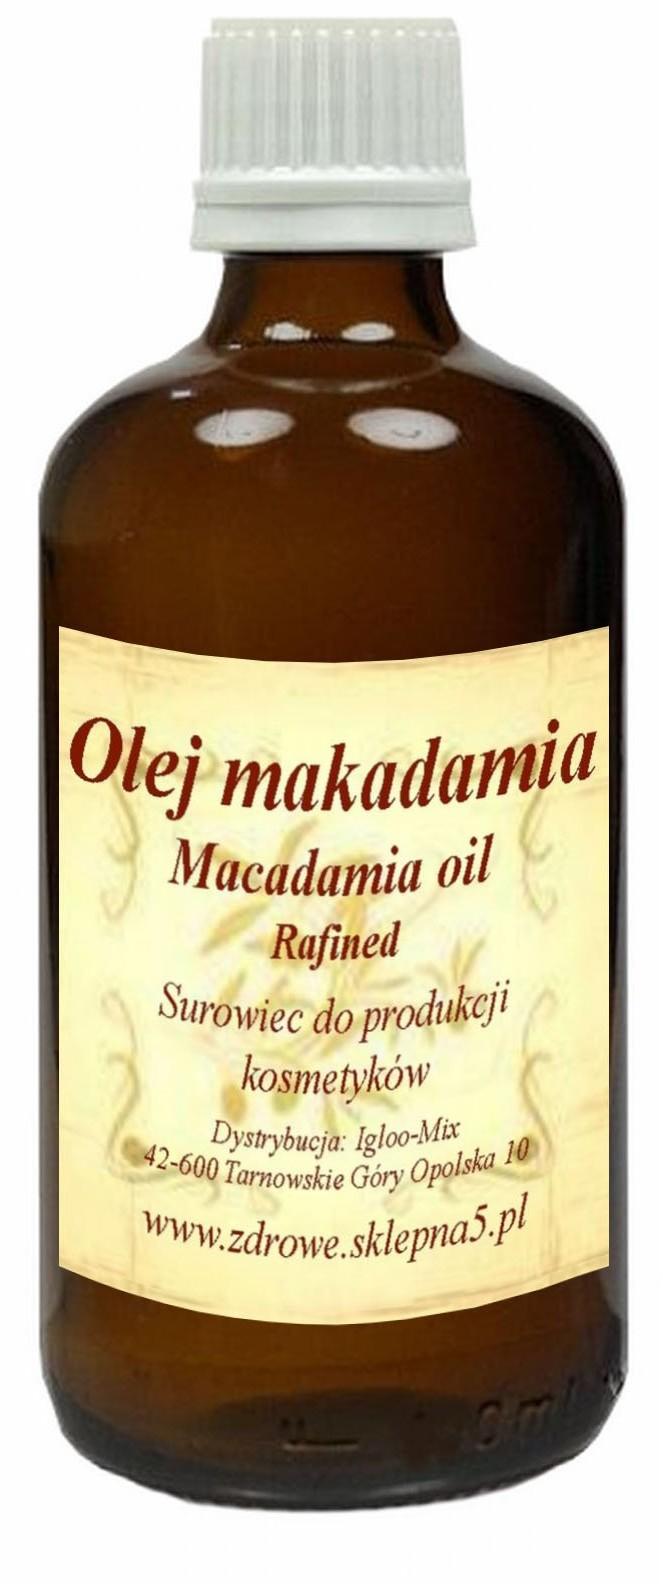 Olej Makadamia 100ml - Macadamia